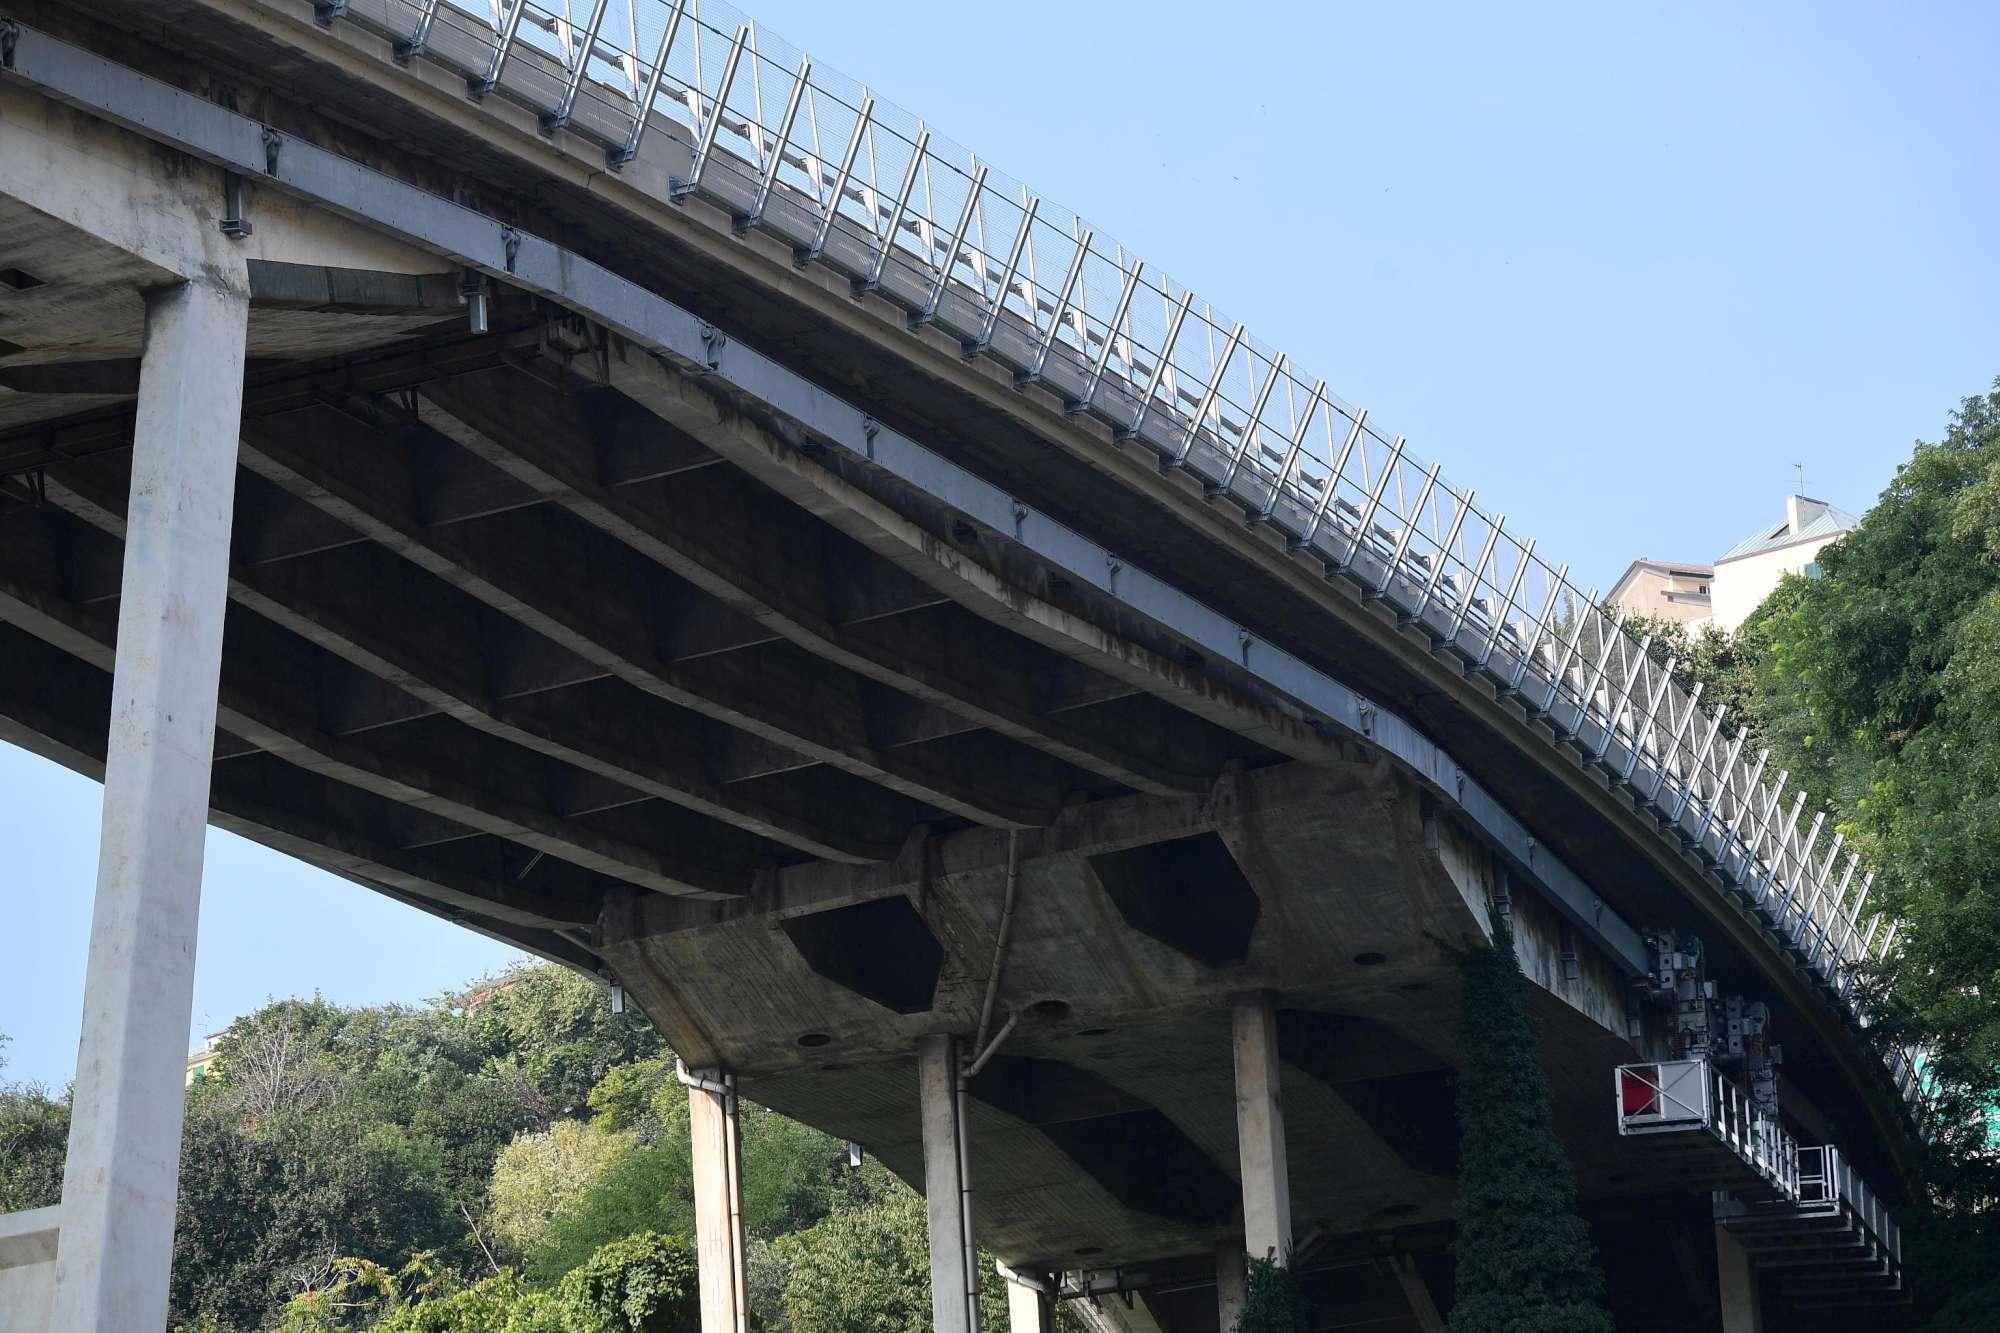 Genova, parte ovest del ponte Morandi gravemente deteriorata